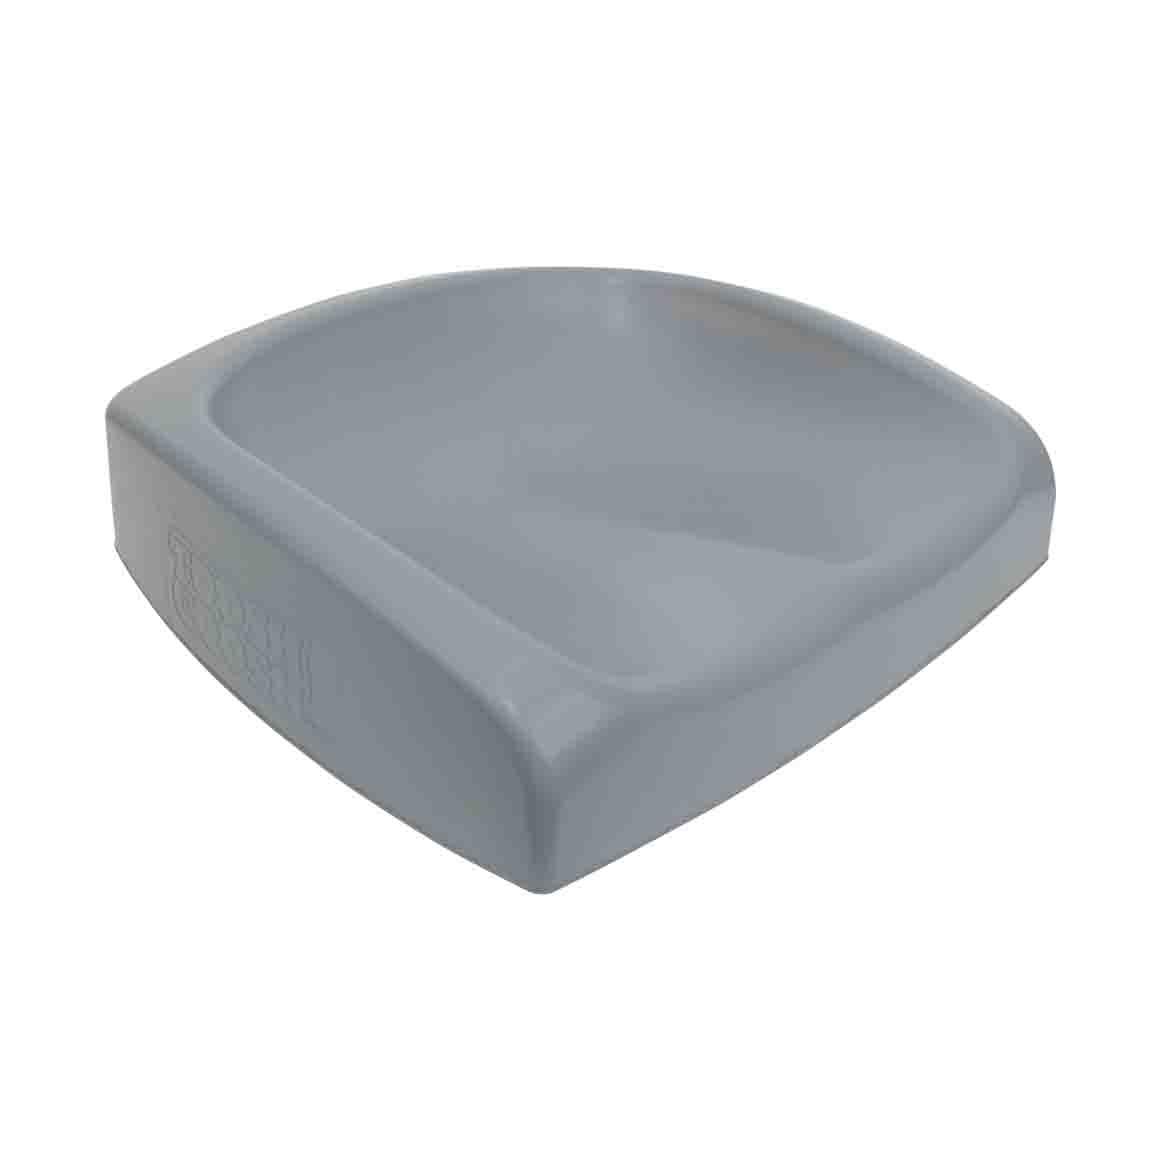 TooshCoosh Booster Seat - LIGHT GREY | Trada Marketplace